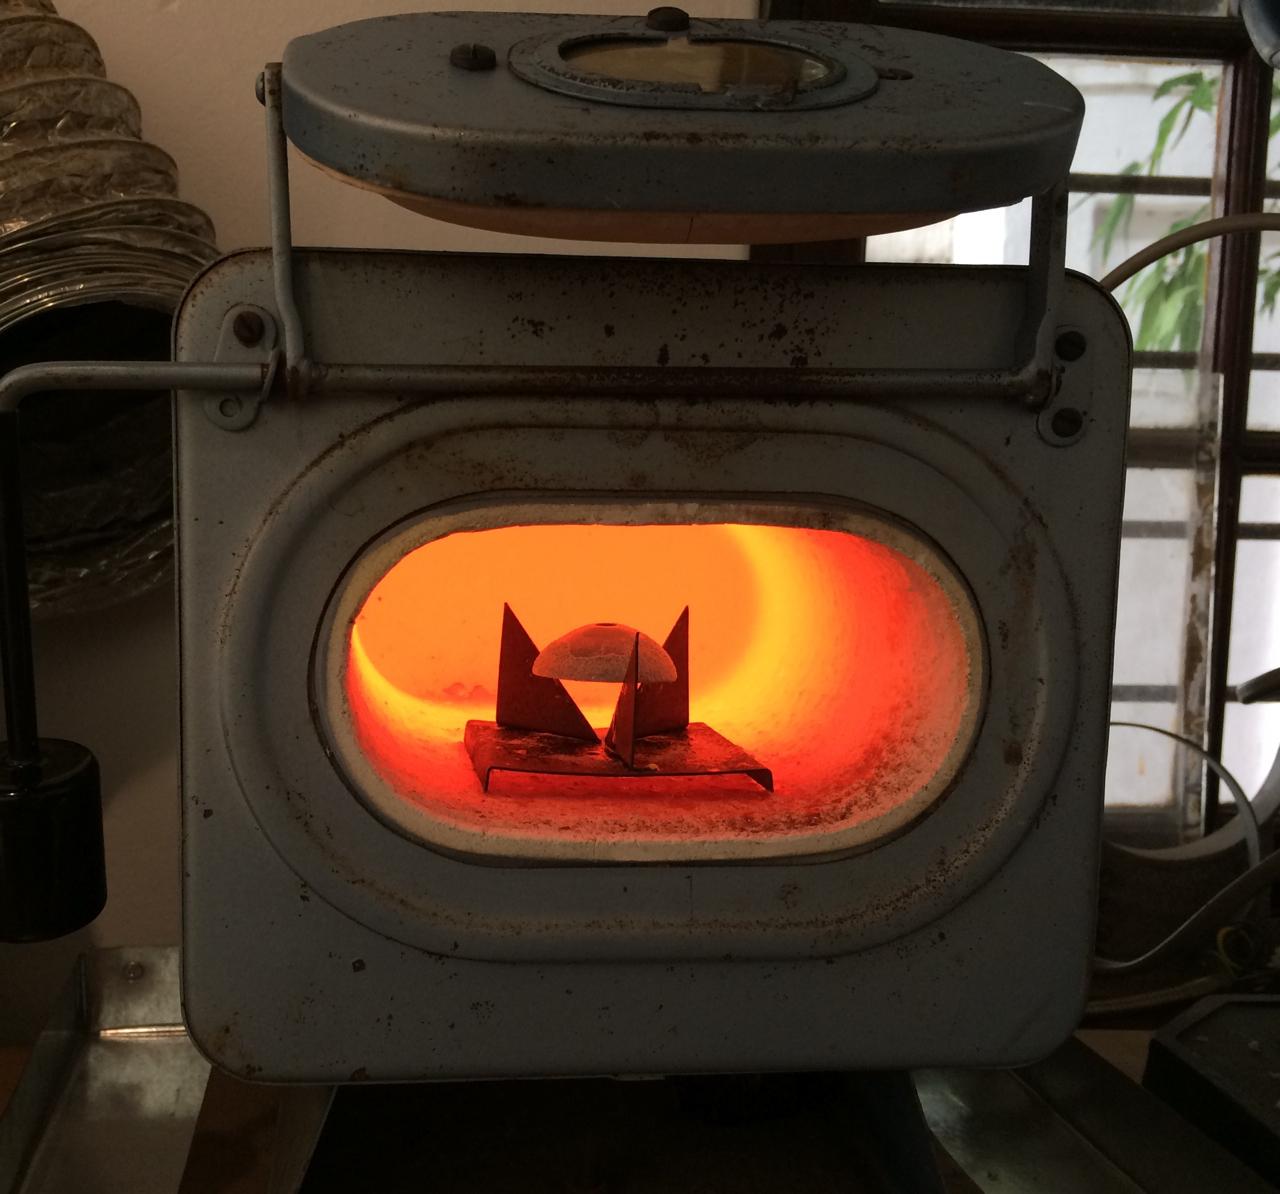 A kiln, glowing hot.